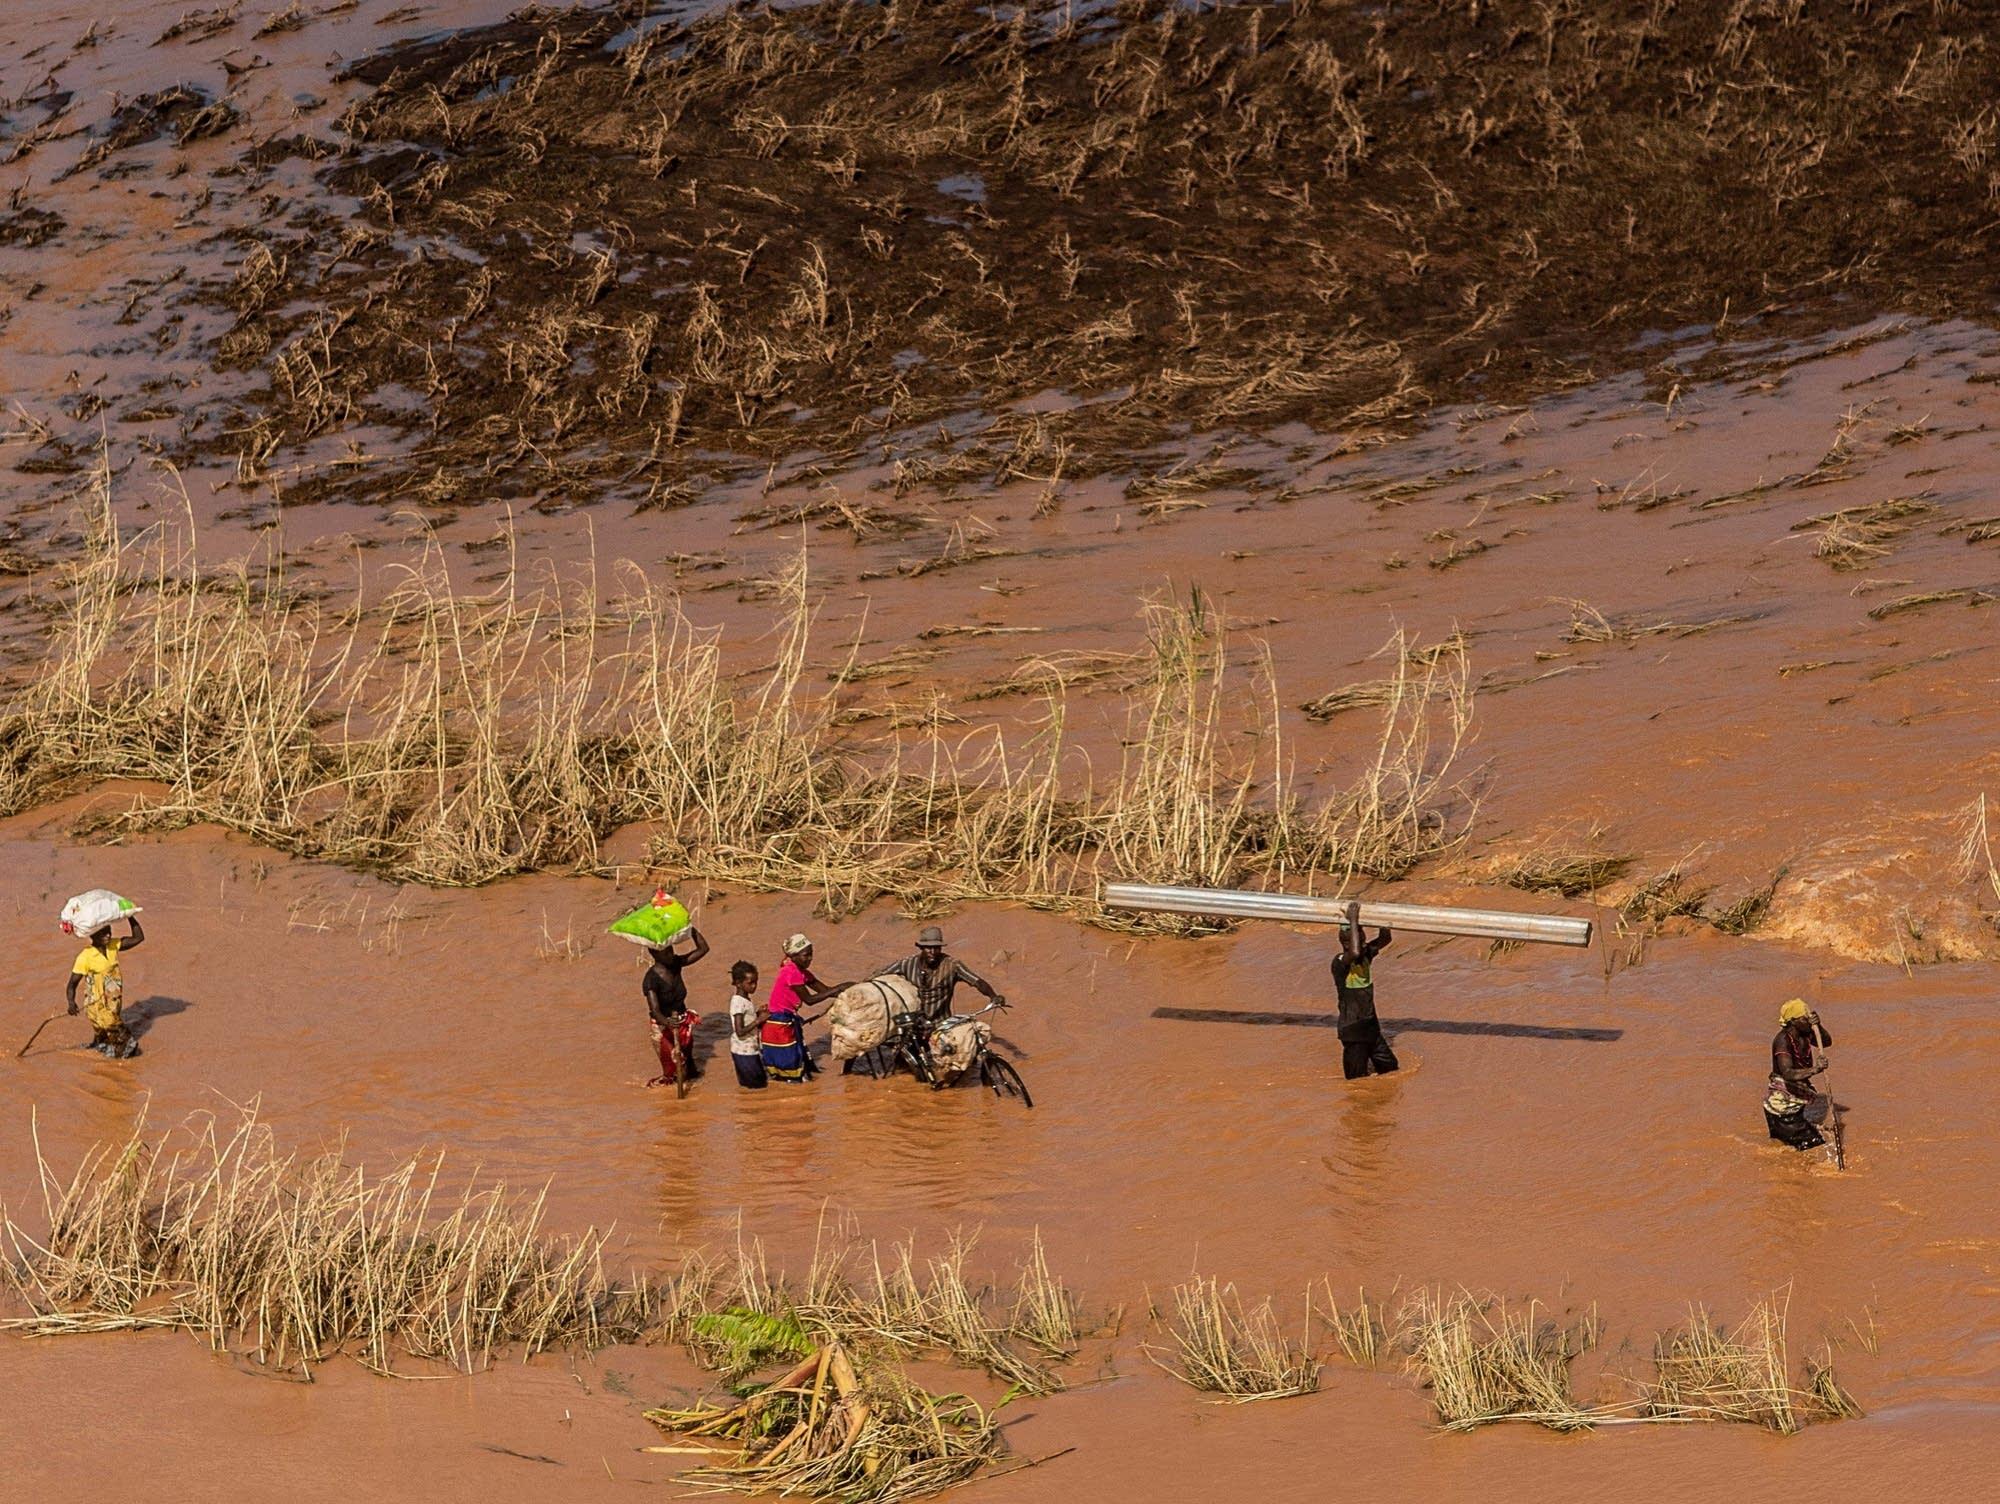 People wade through flood waters from Cyclone Idai